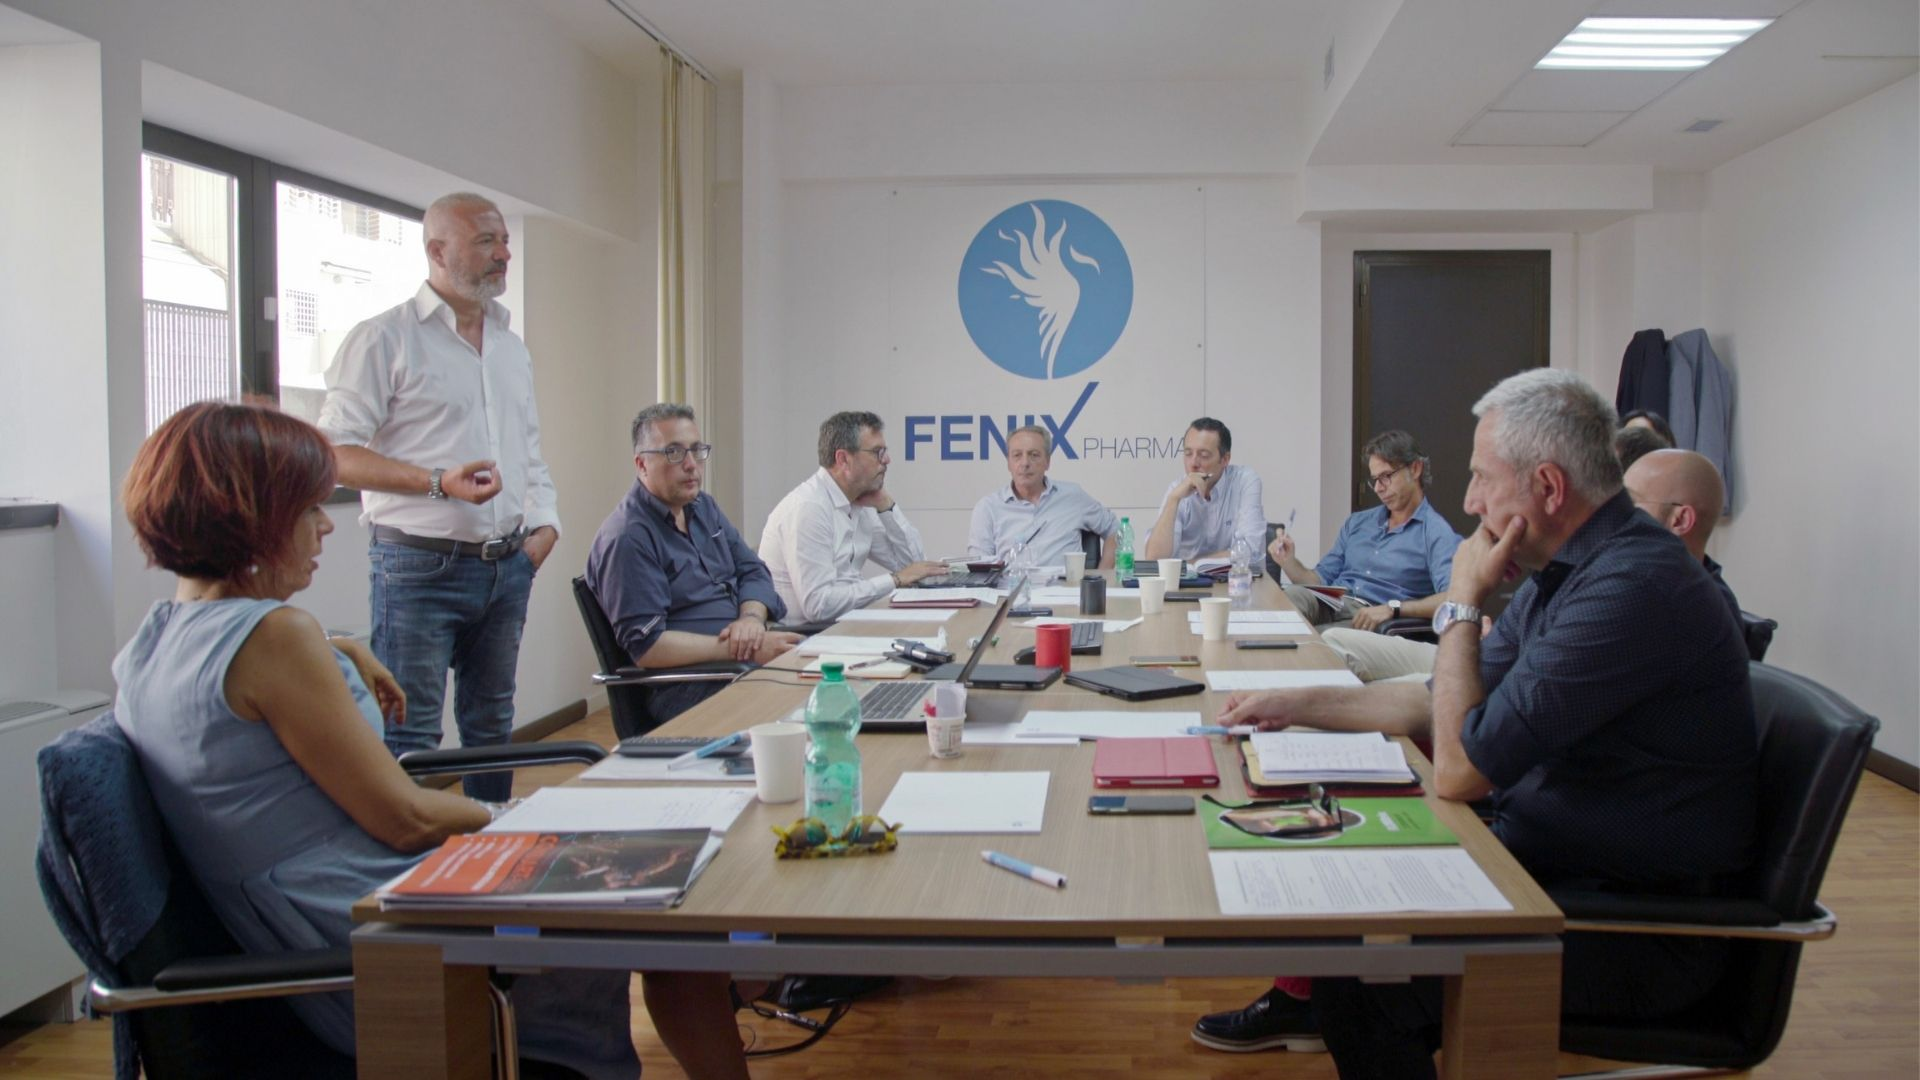 Fenix Life Team Meeting